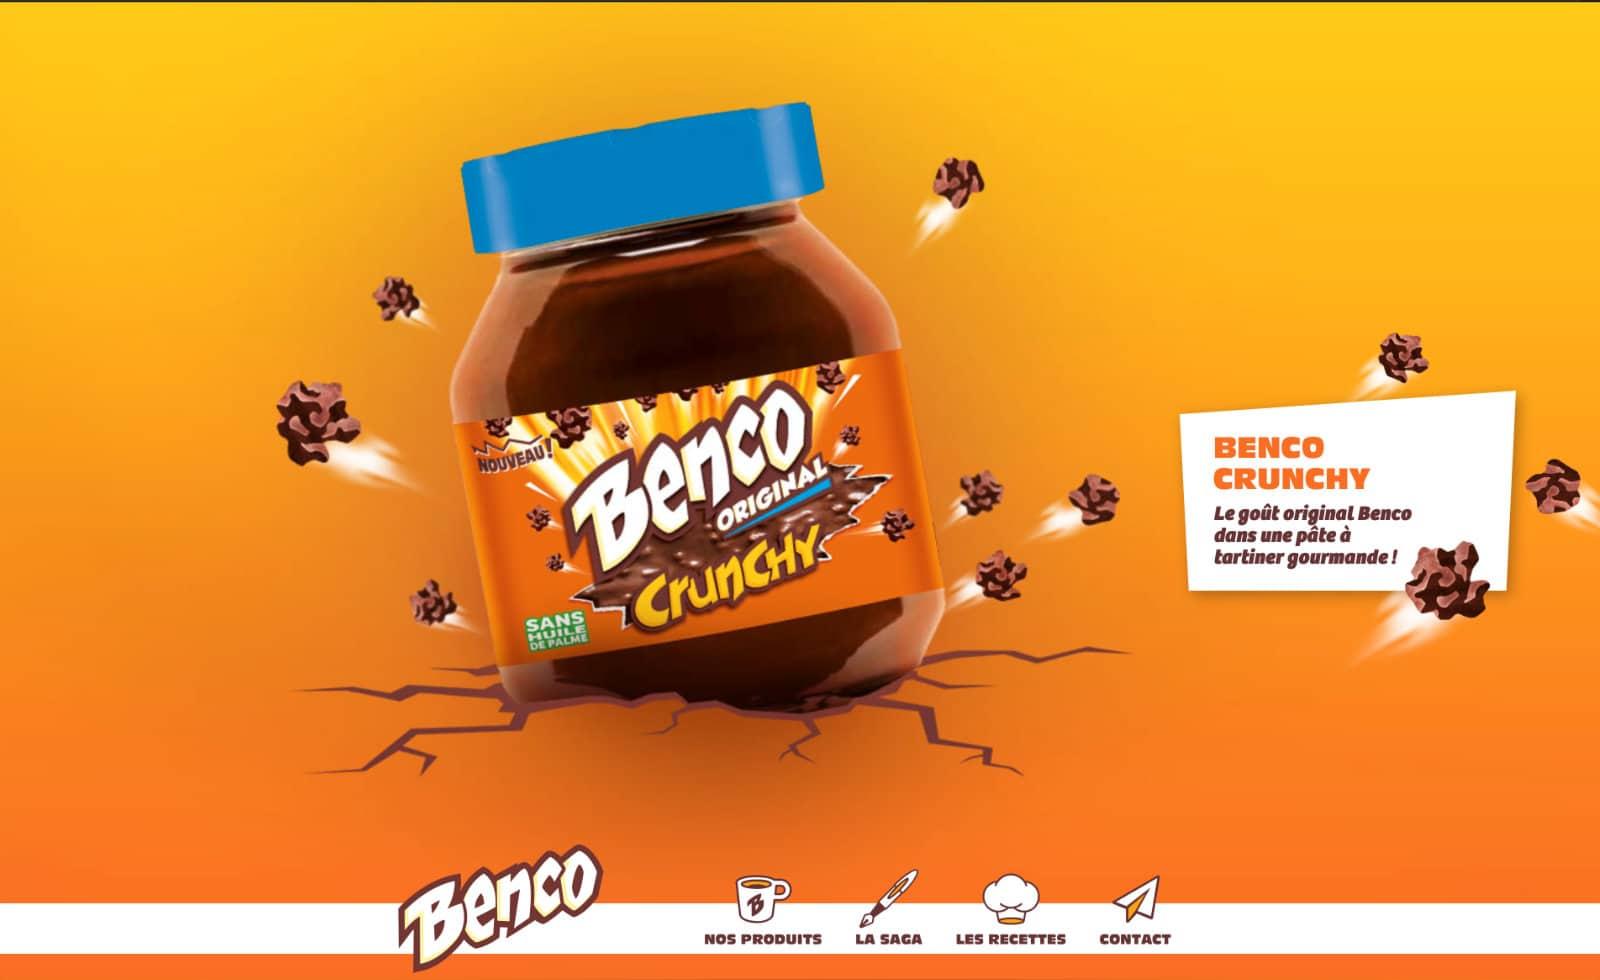 page d'accueil benco